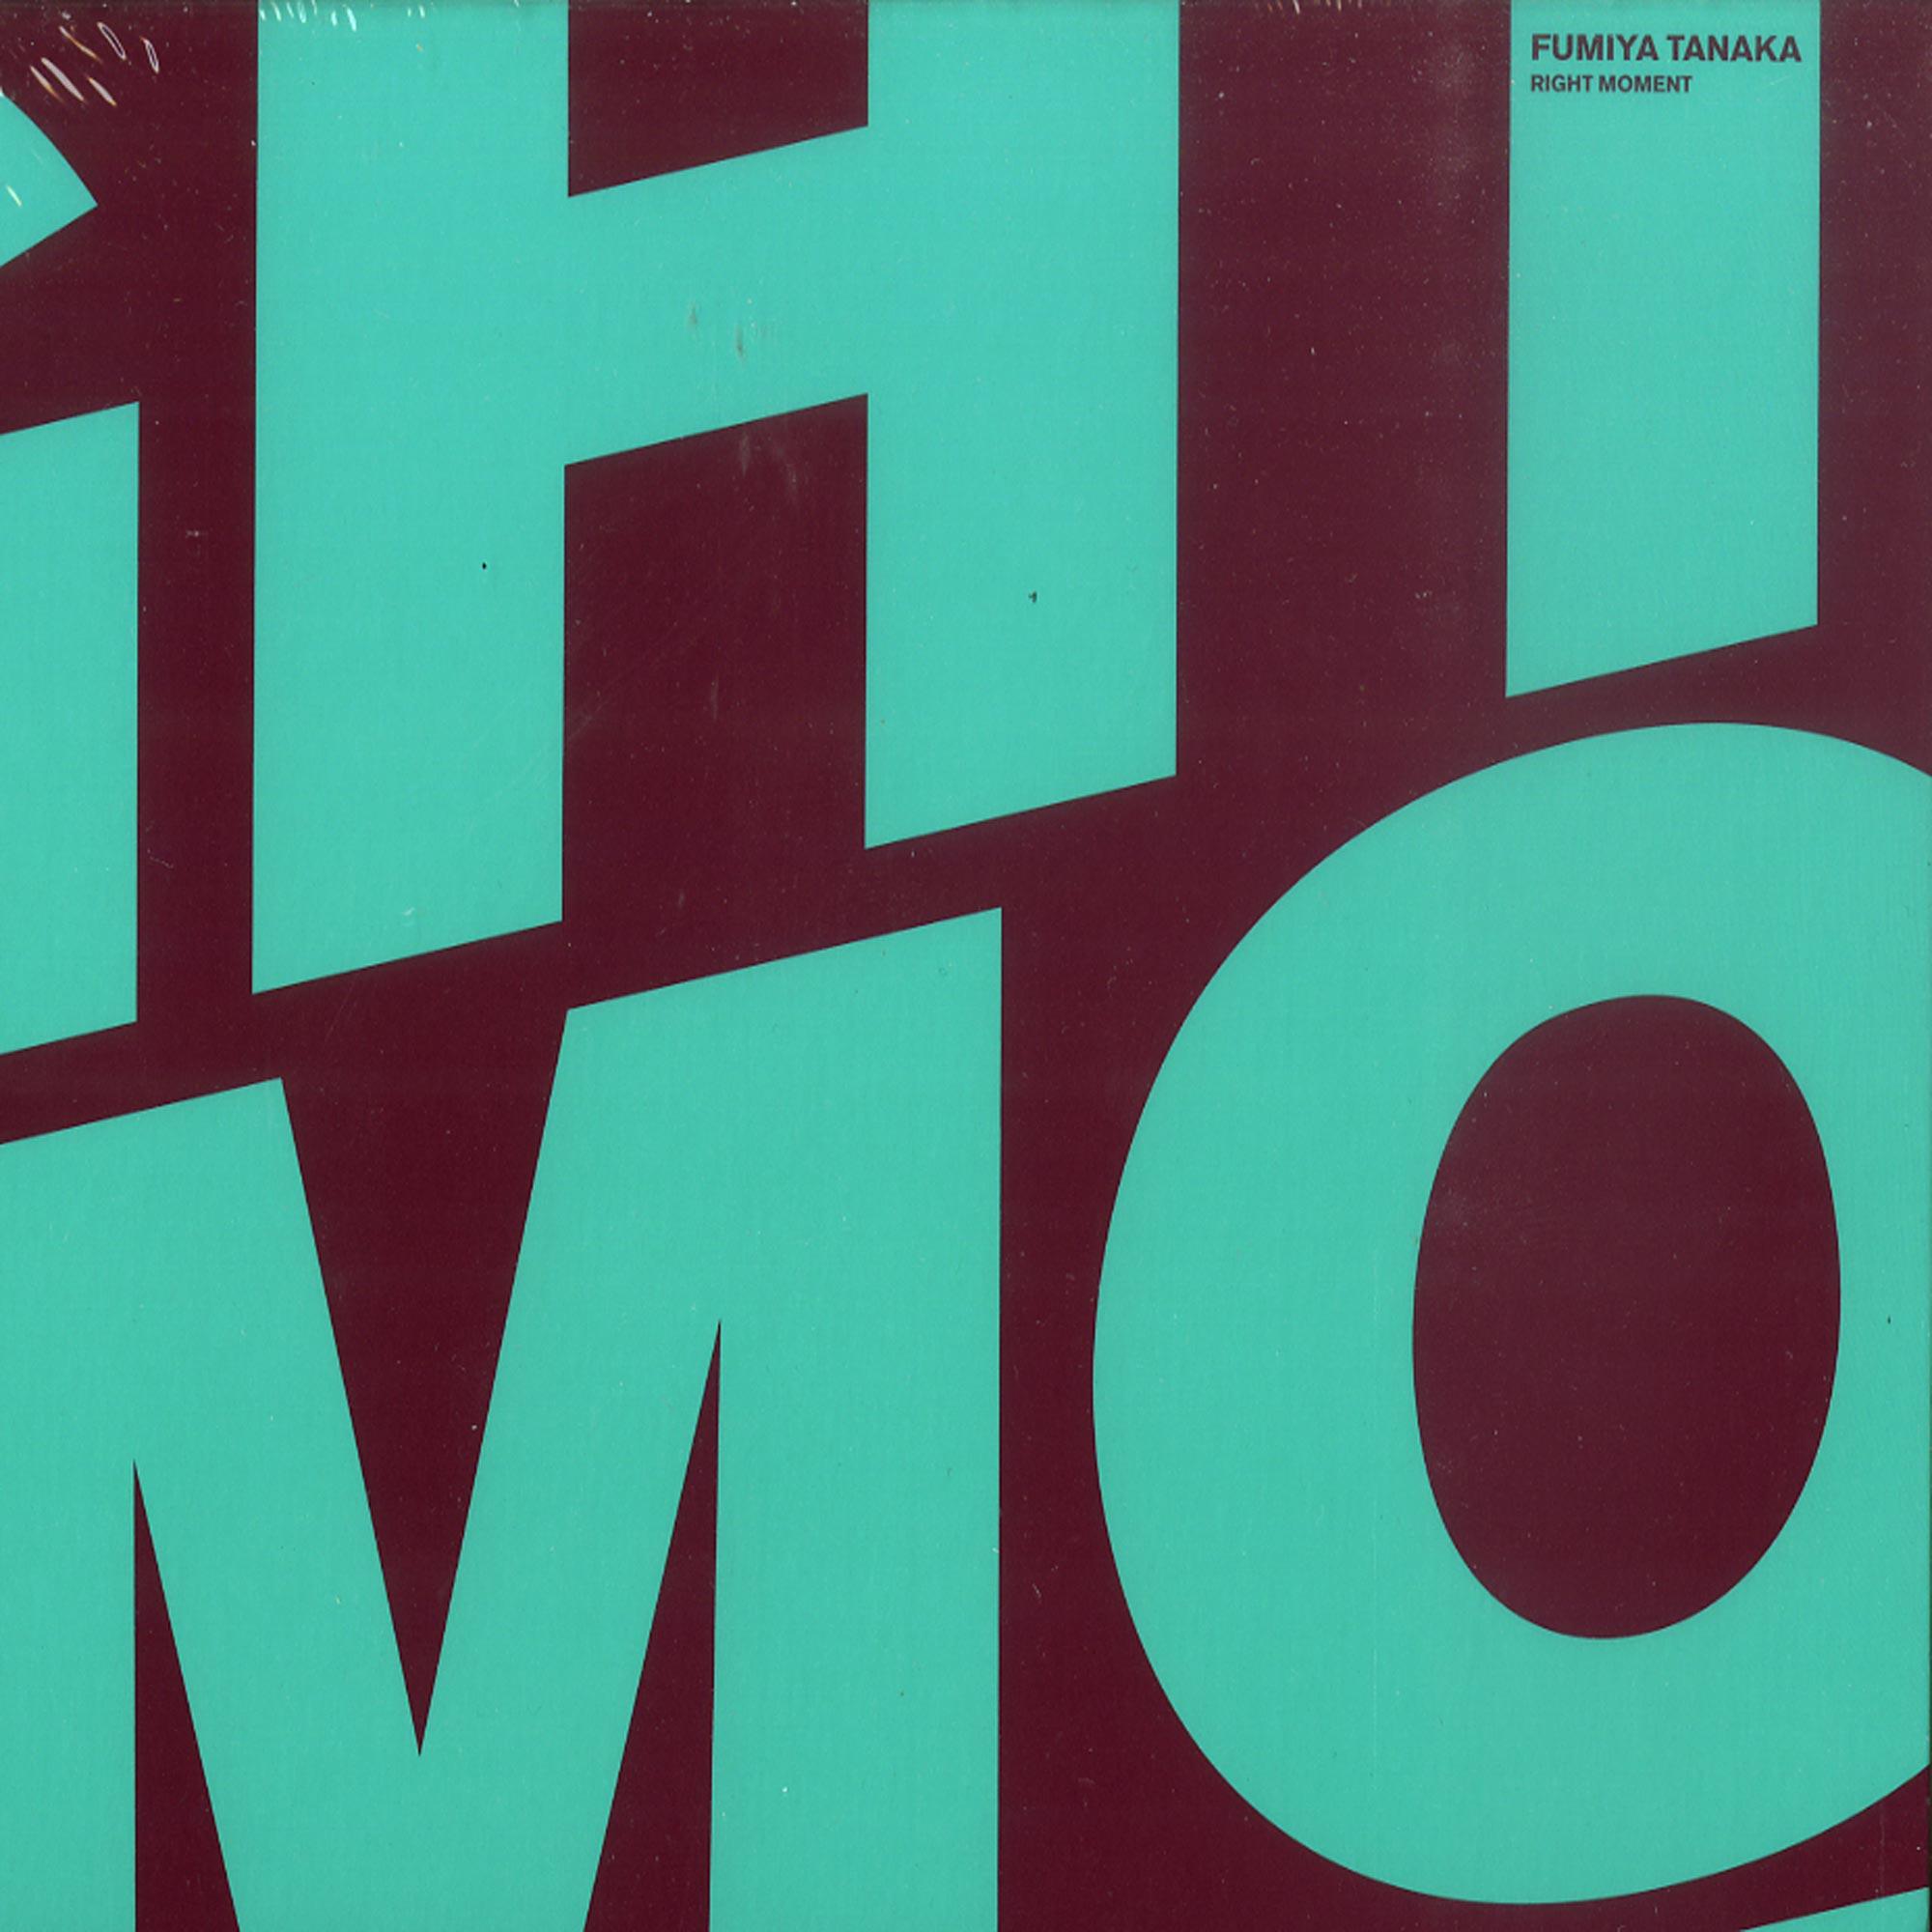 Fumiya Tanaka - RIGHT MOMENT